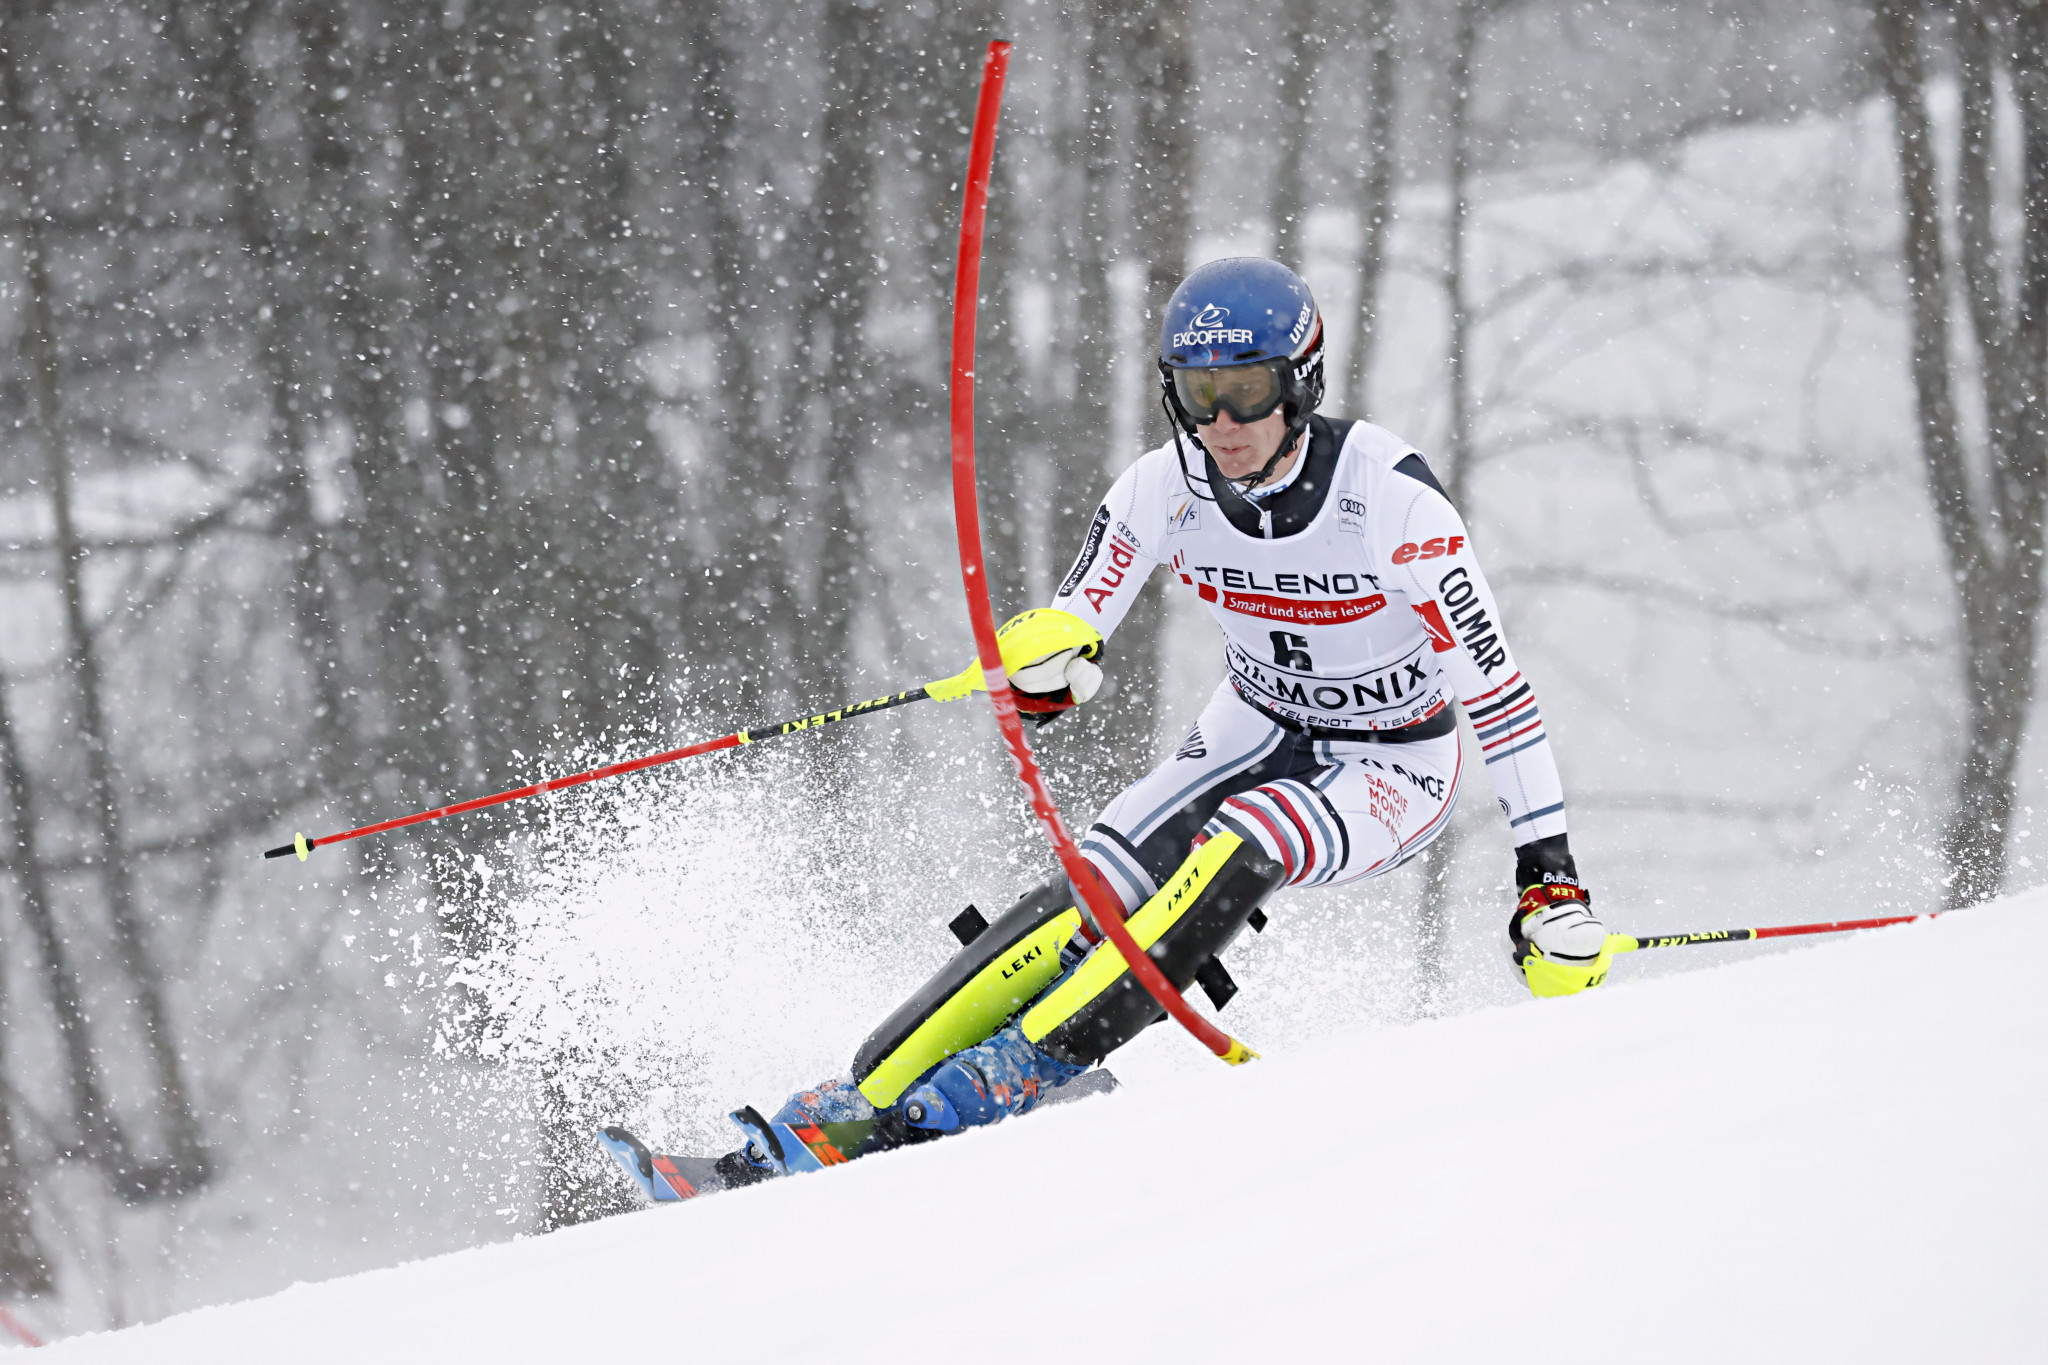 Noël regains winning feeling at Chamonix on first day of Alpine Skiing World Cup slalom doubleheader